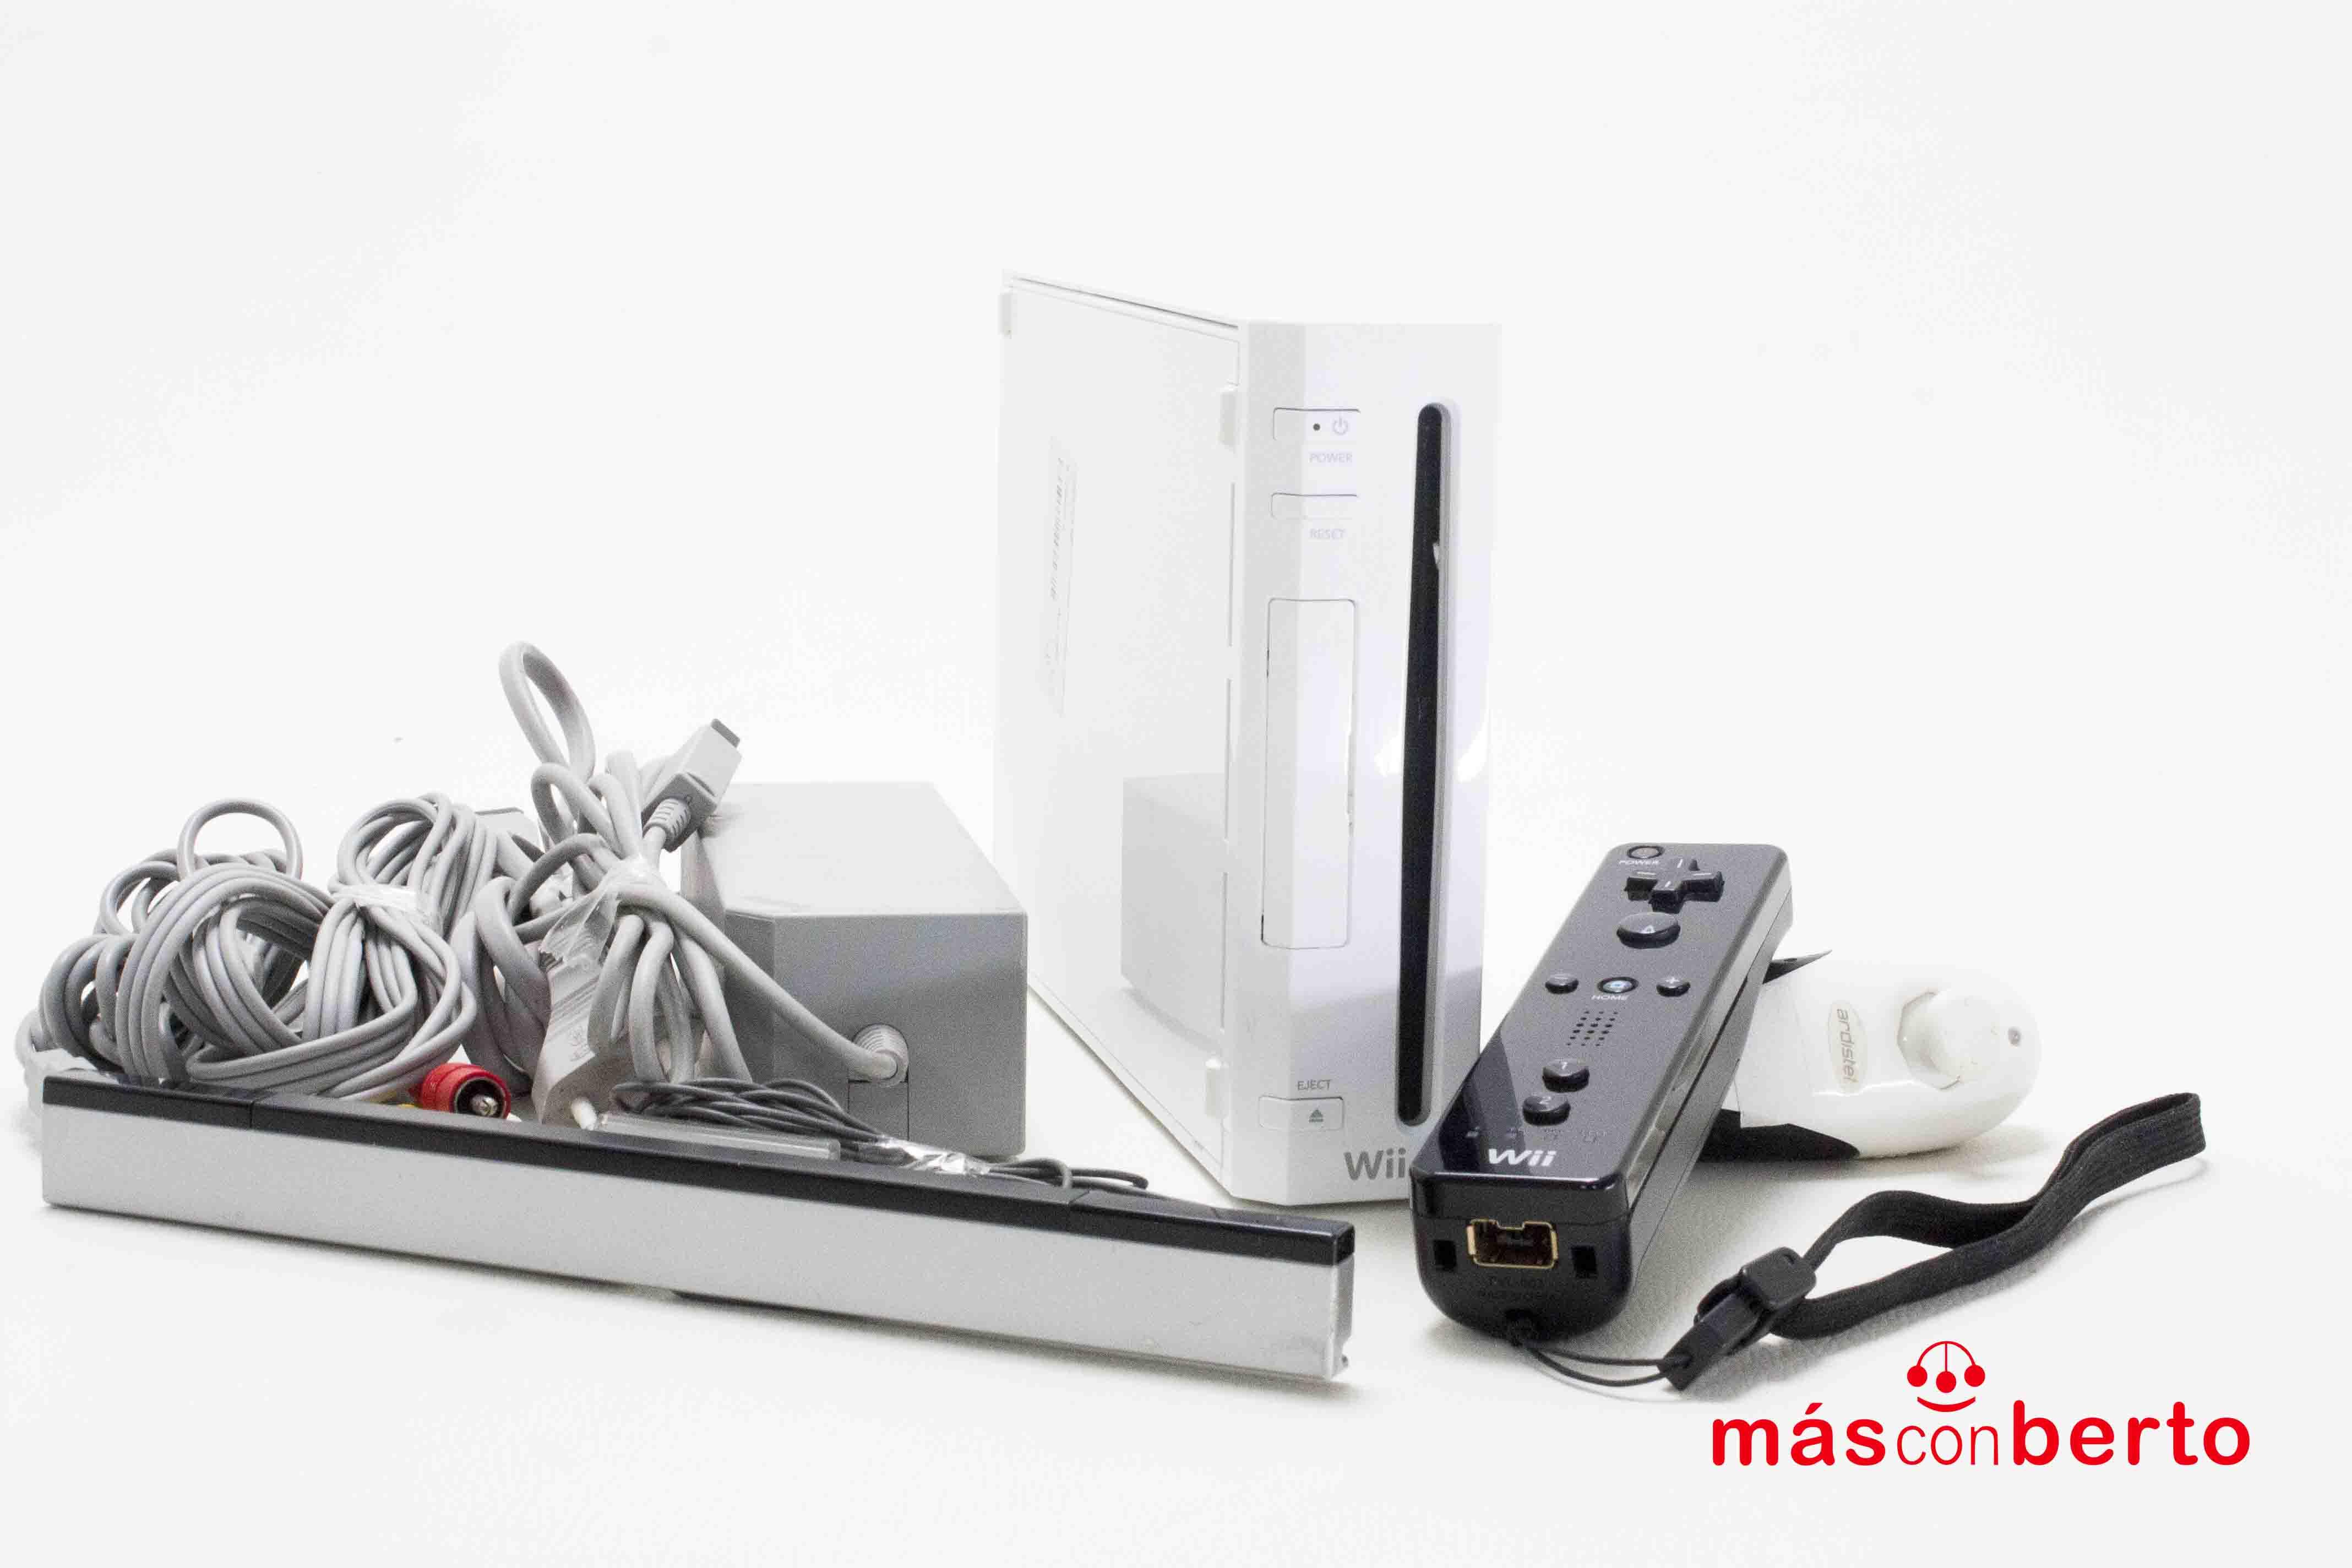 Consola Nintendo Wii blanca